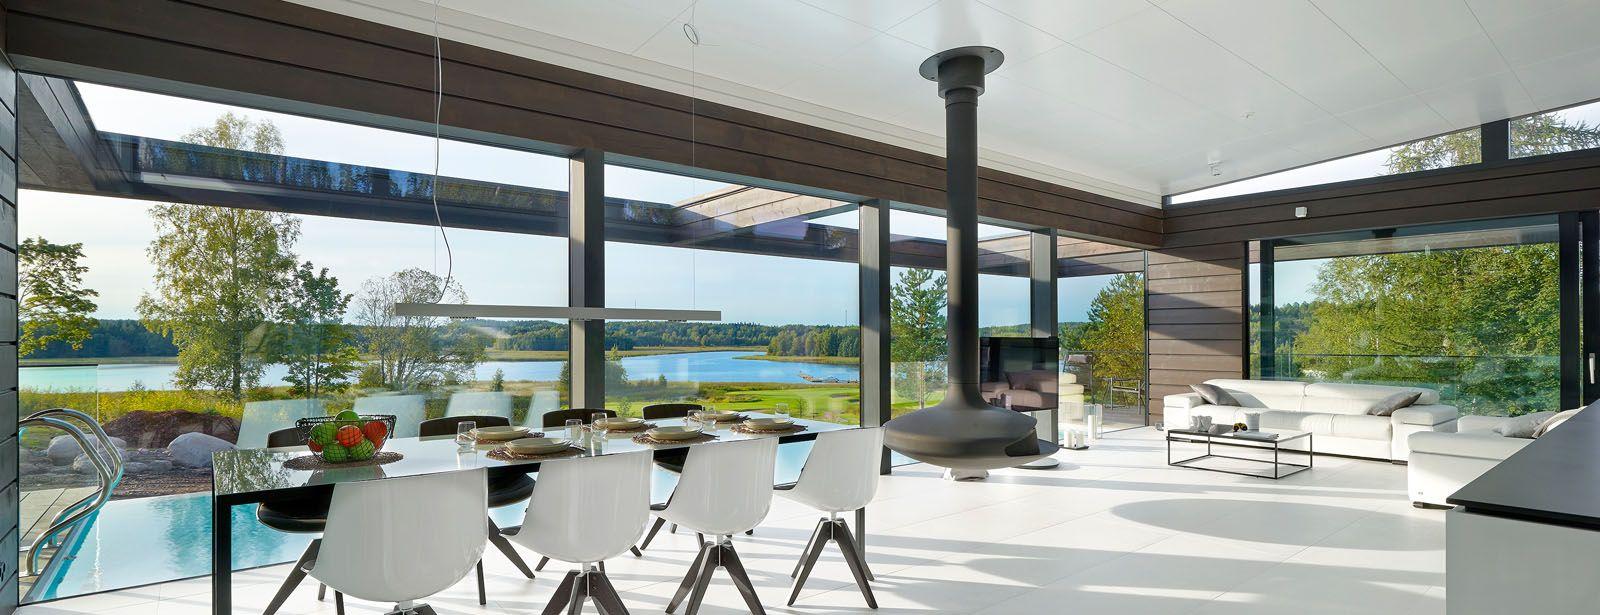 Parhaat Talopaketit Honkataloilta Honkatalot Talopaketti Modern Villa Design House Inspiration Dream House